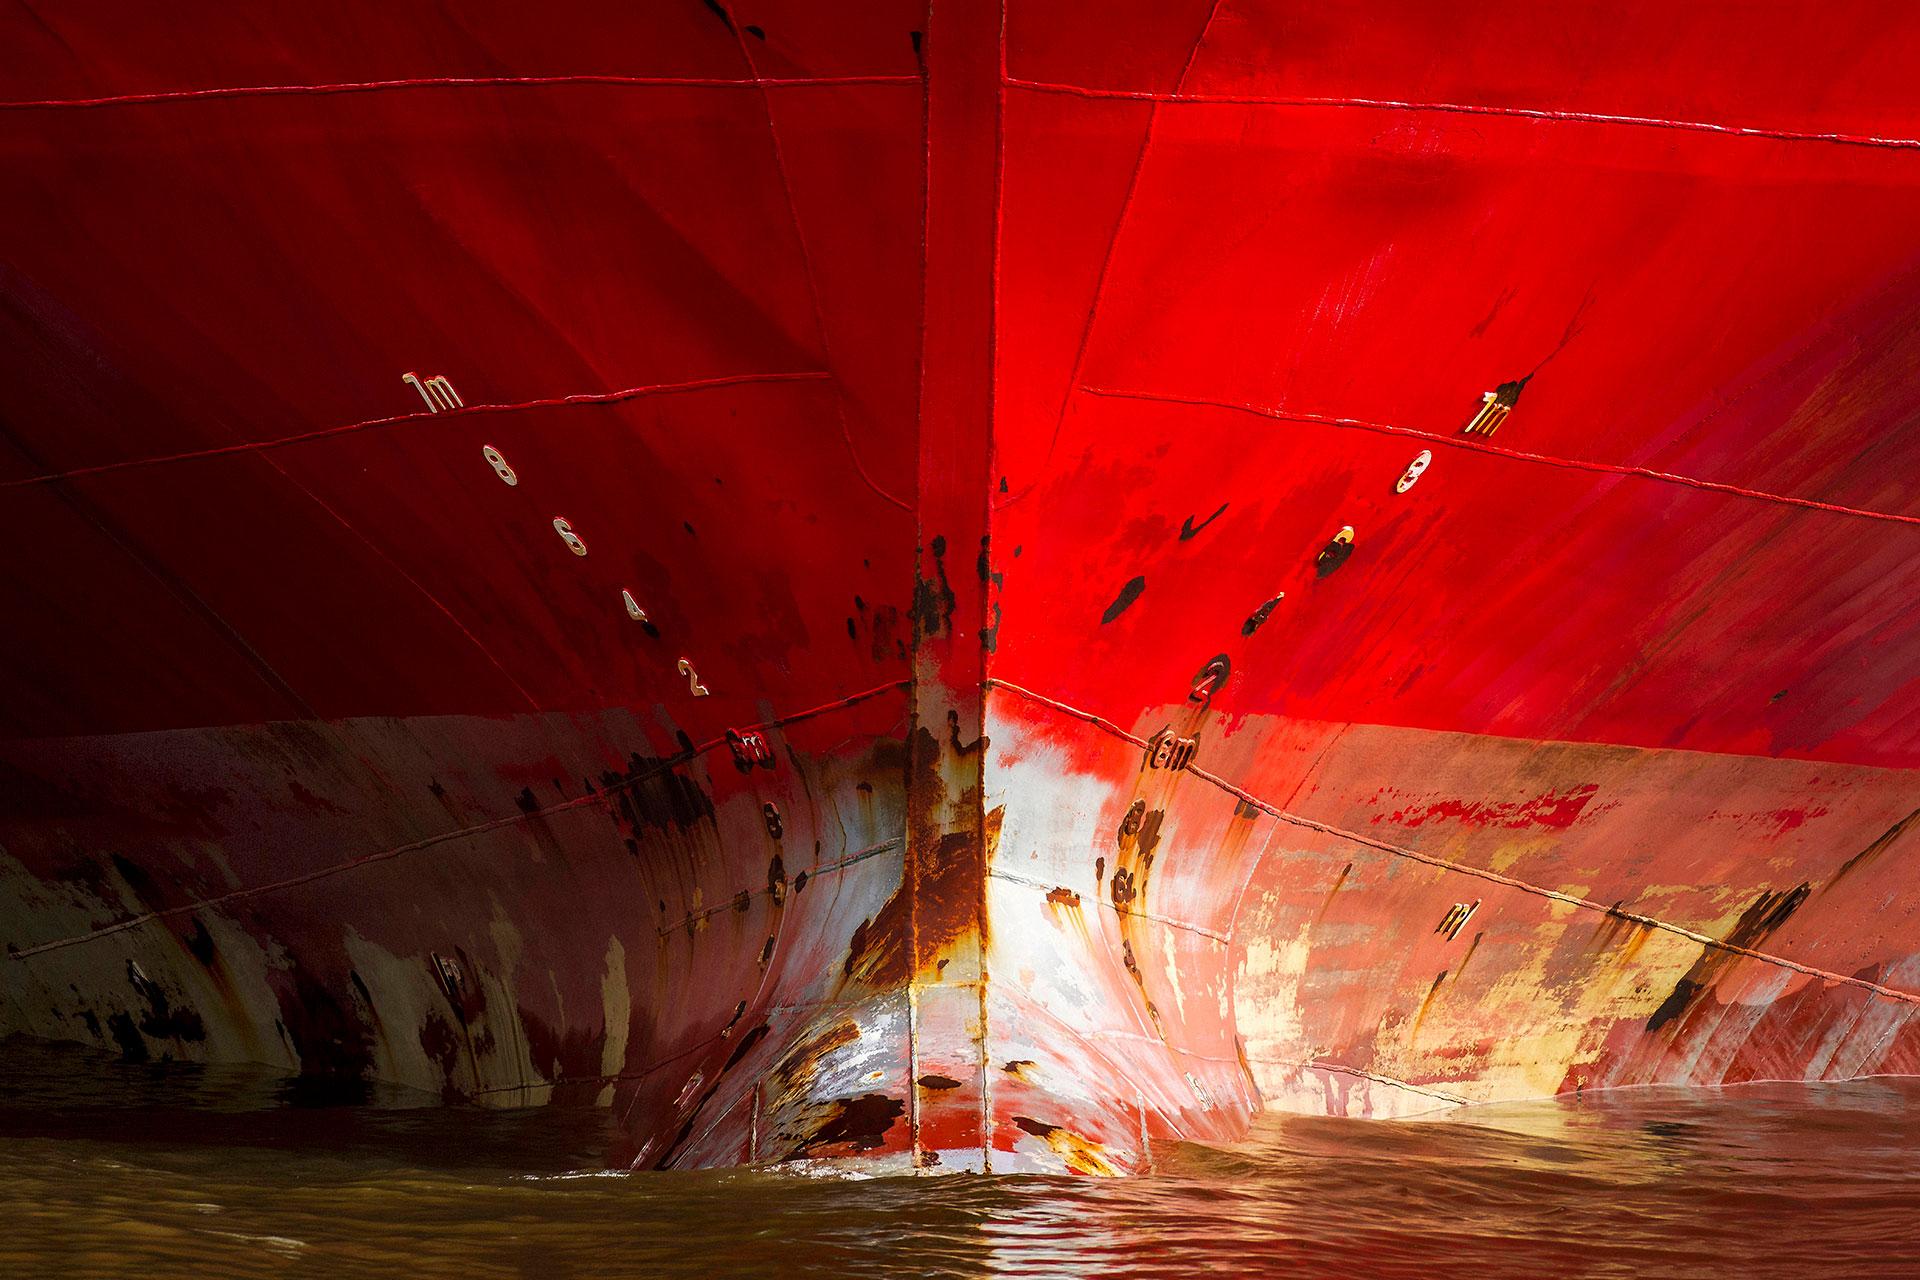 JS001-der-rote-bug-wandbild-bild-auf-leinwand-acrylglas-aludibond